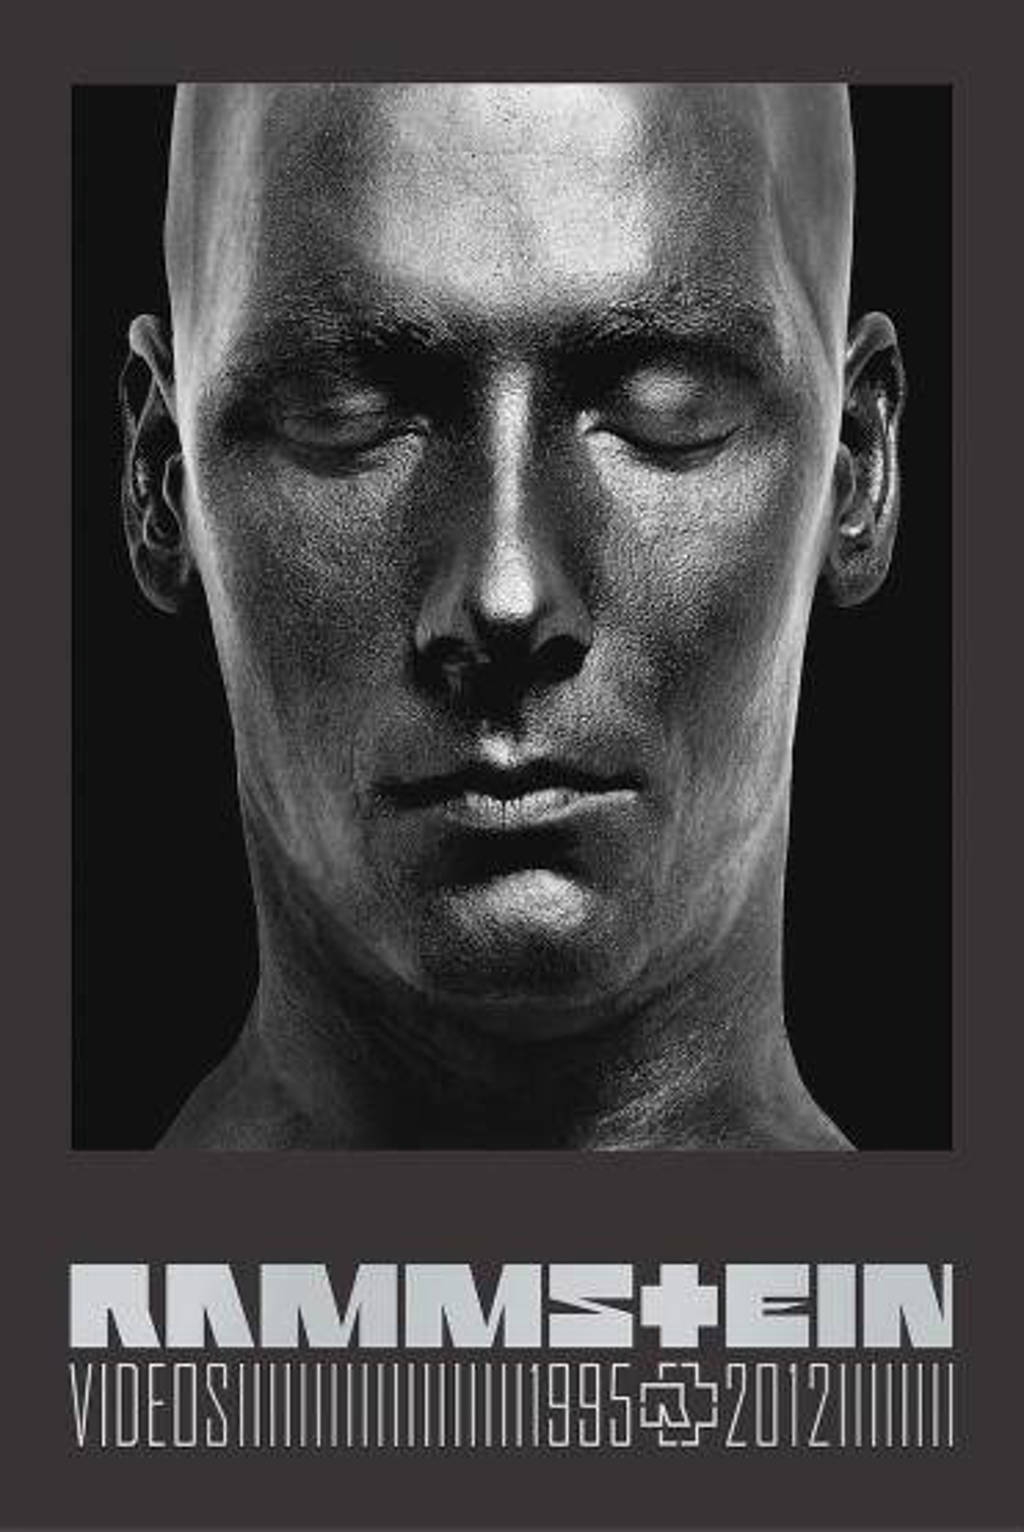 Rammstein - Videos 1995 - 2012 (Blu-ray)